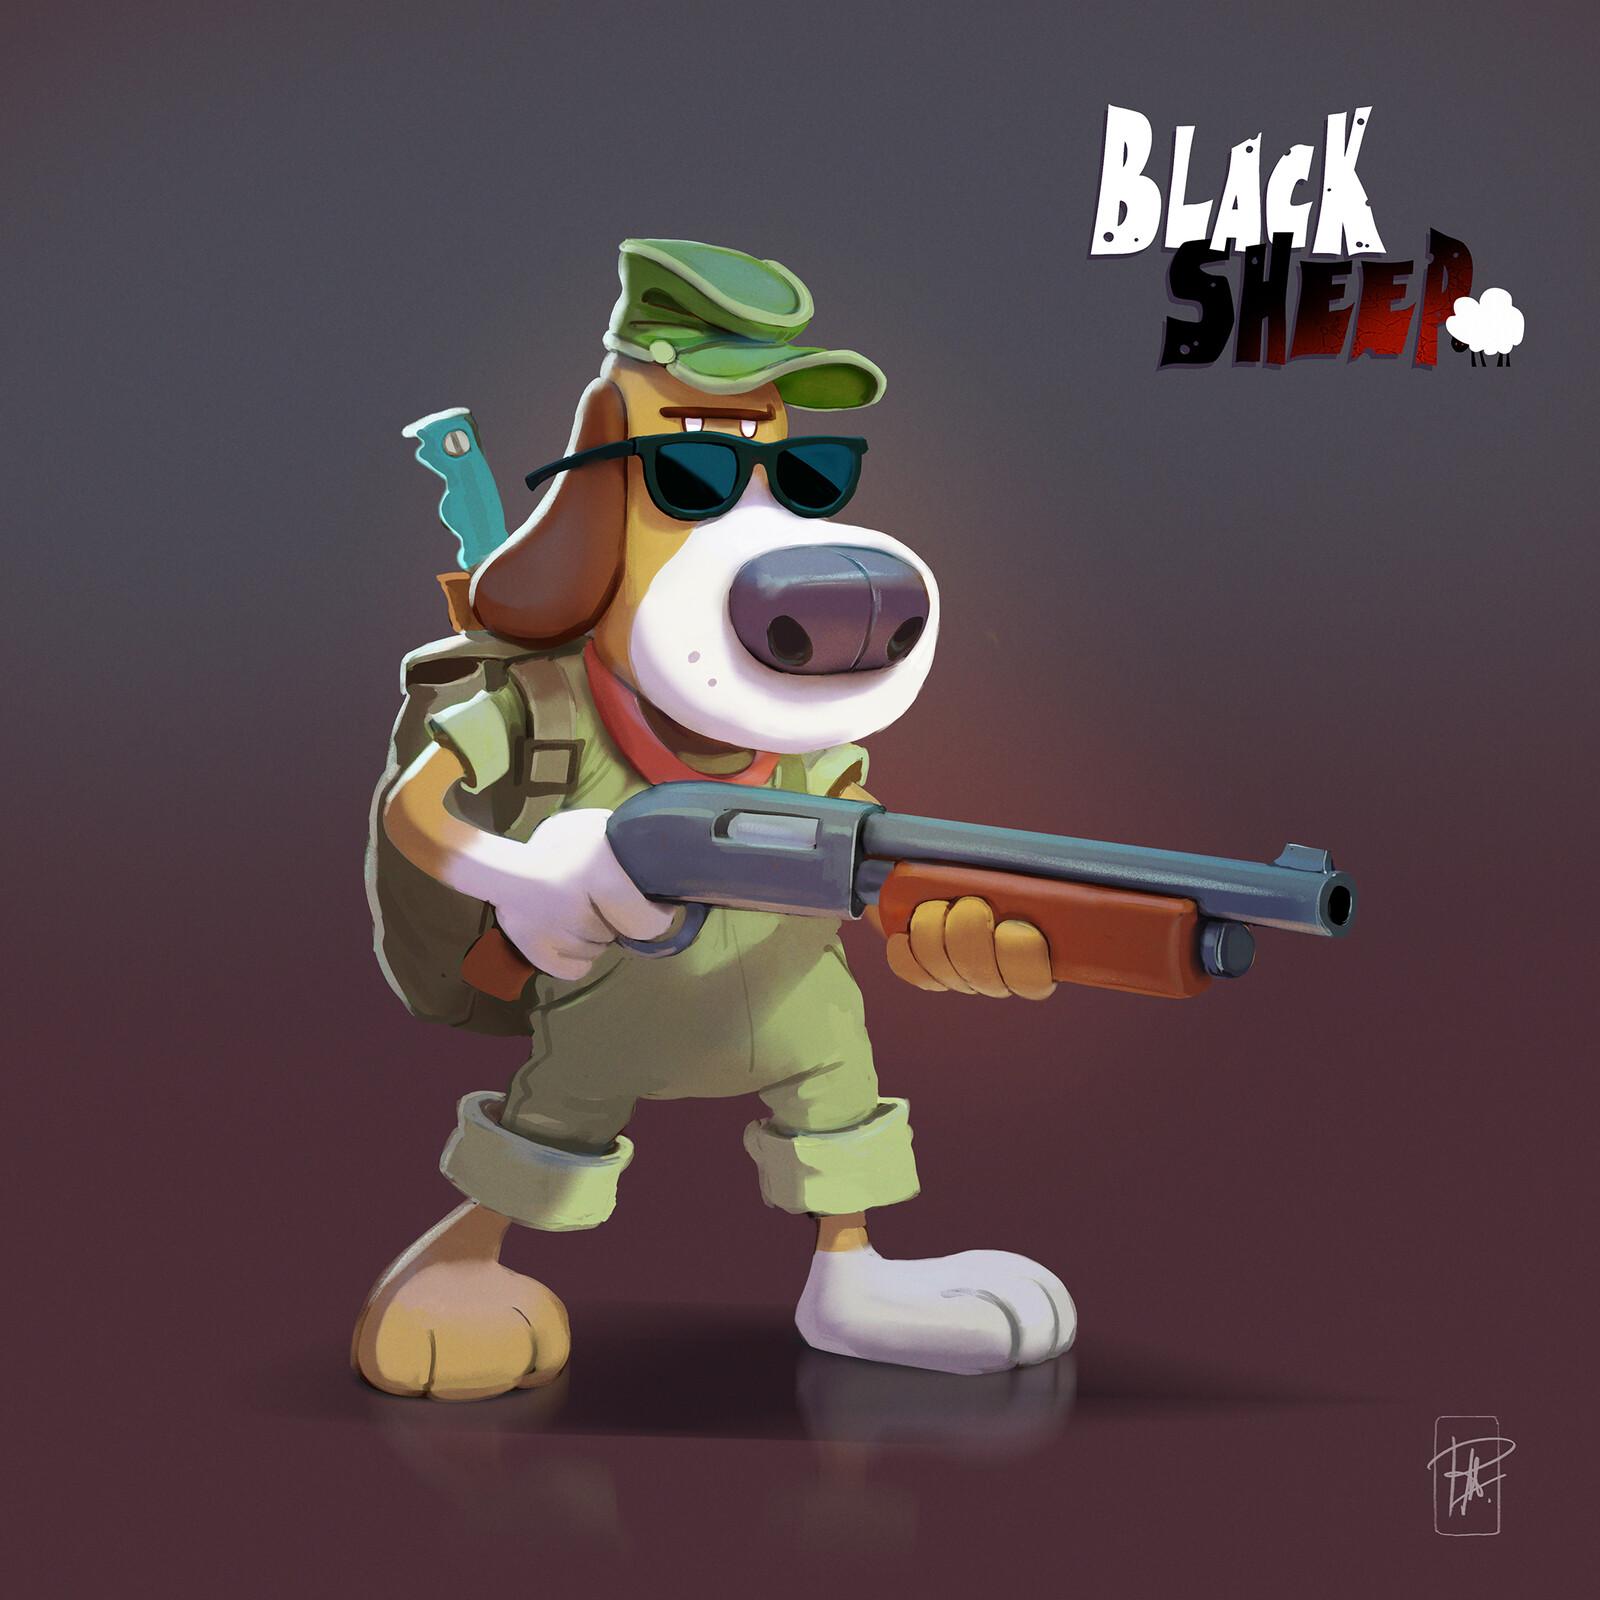 Black Sheep character development